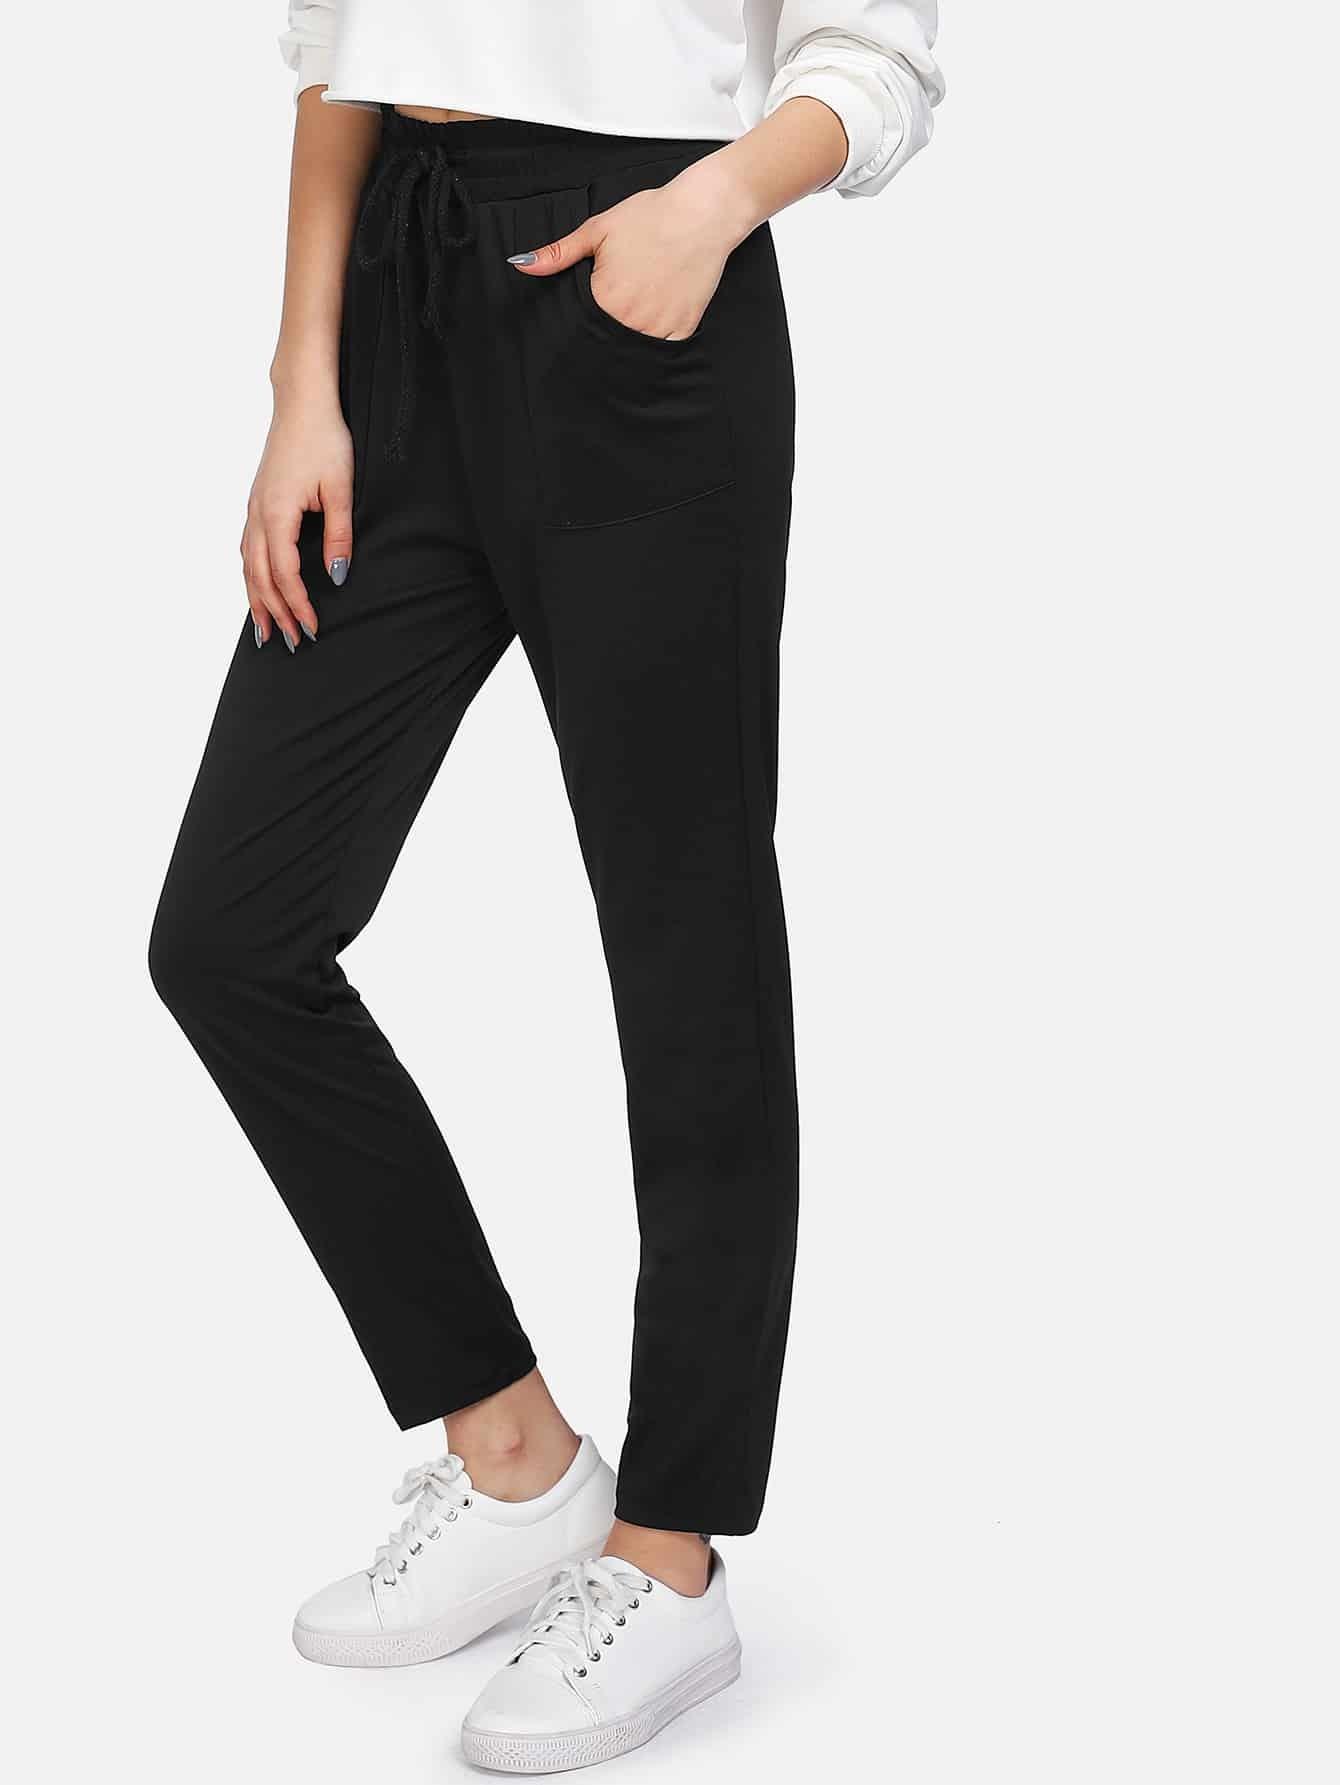 Drawstring Waist Pants plus size ruffle drawstring waist gaucho pants